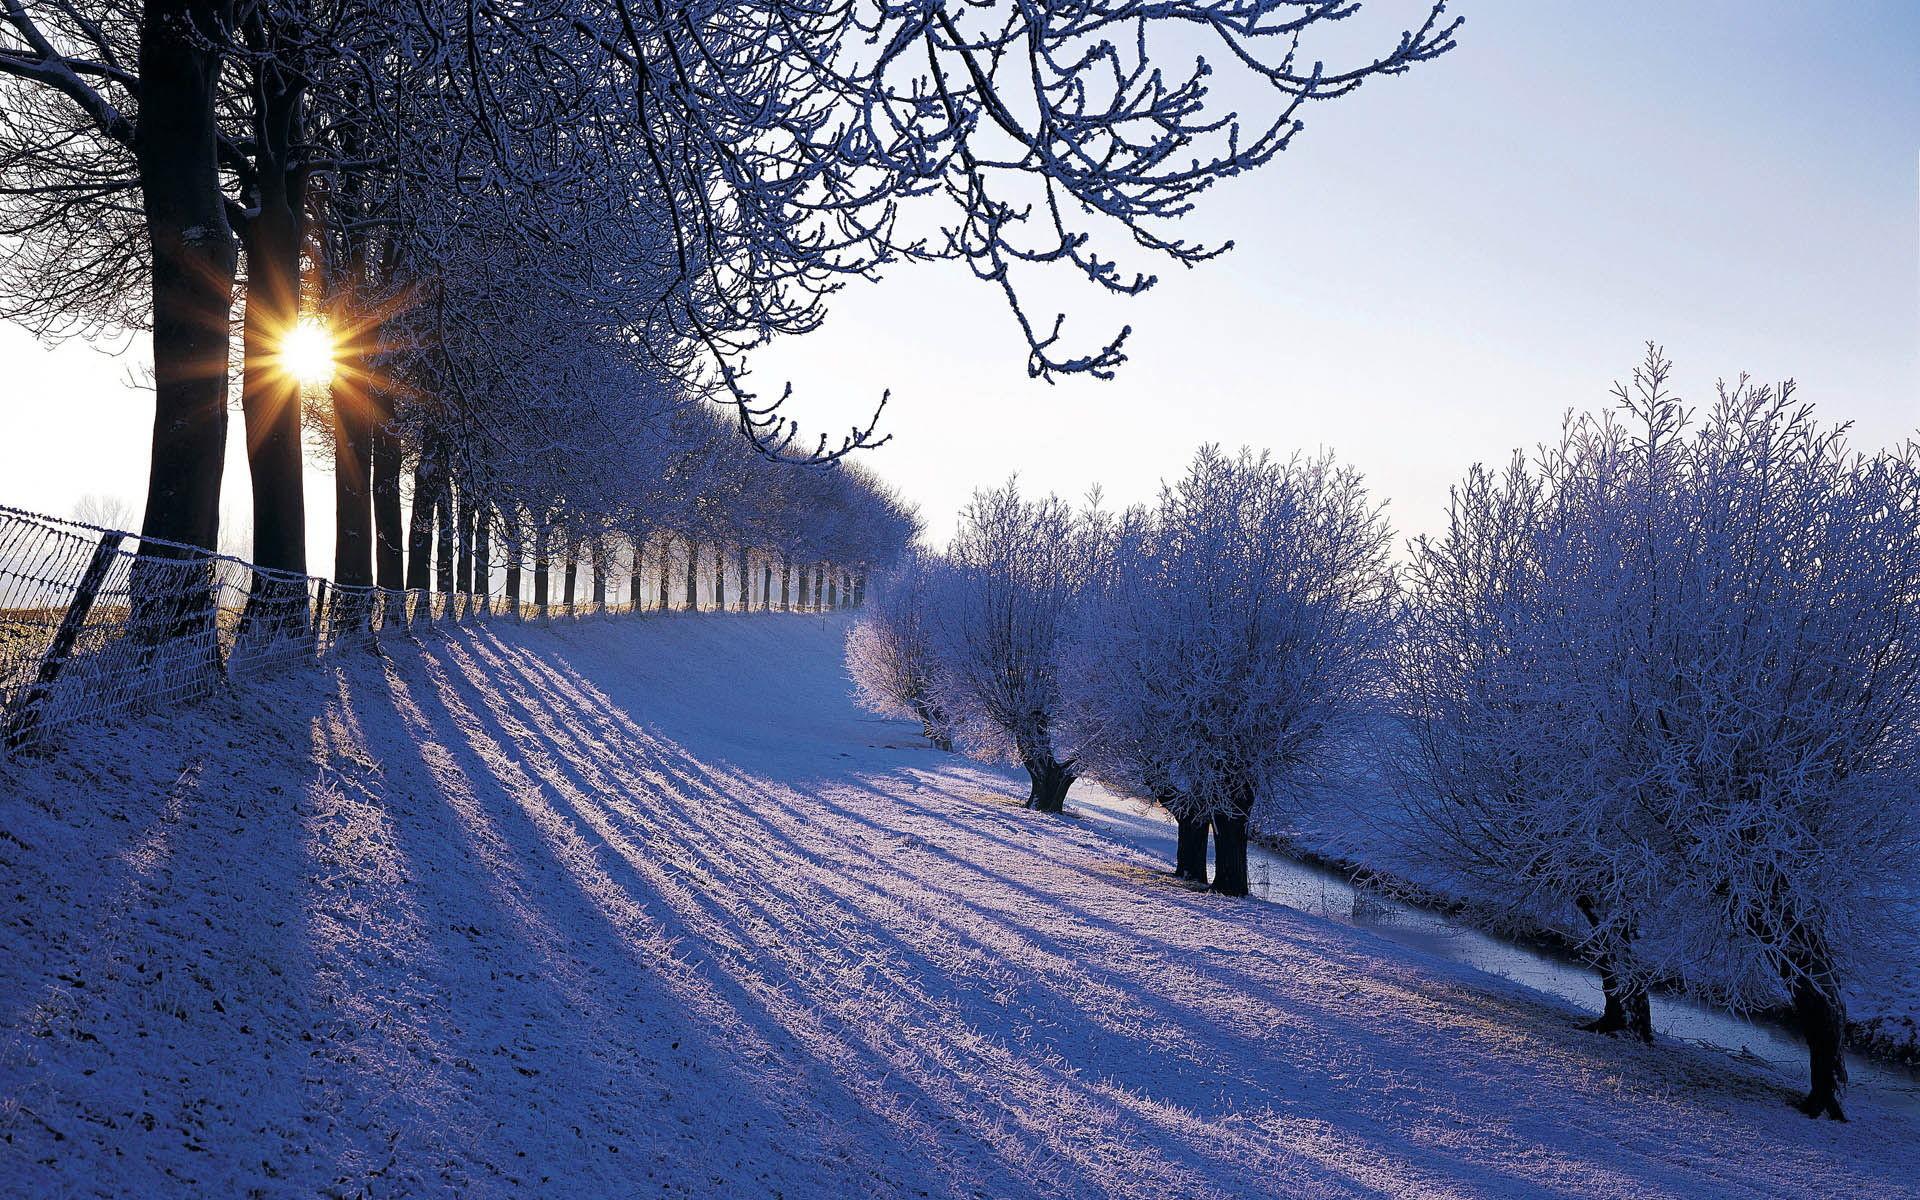 Res: 1920x1200, Snowfall Wallpaper Free Download